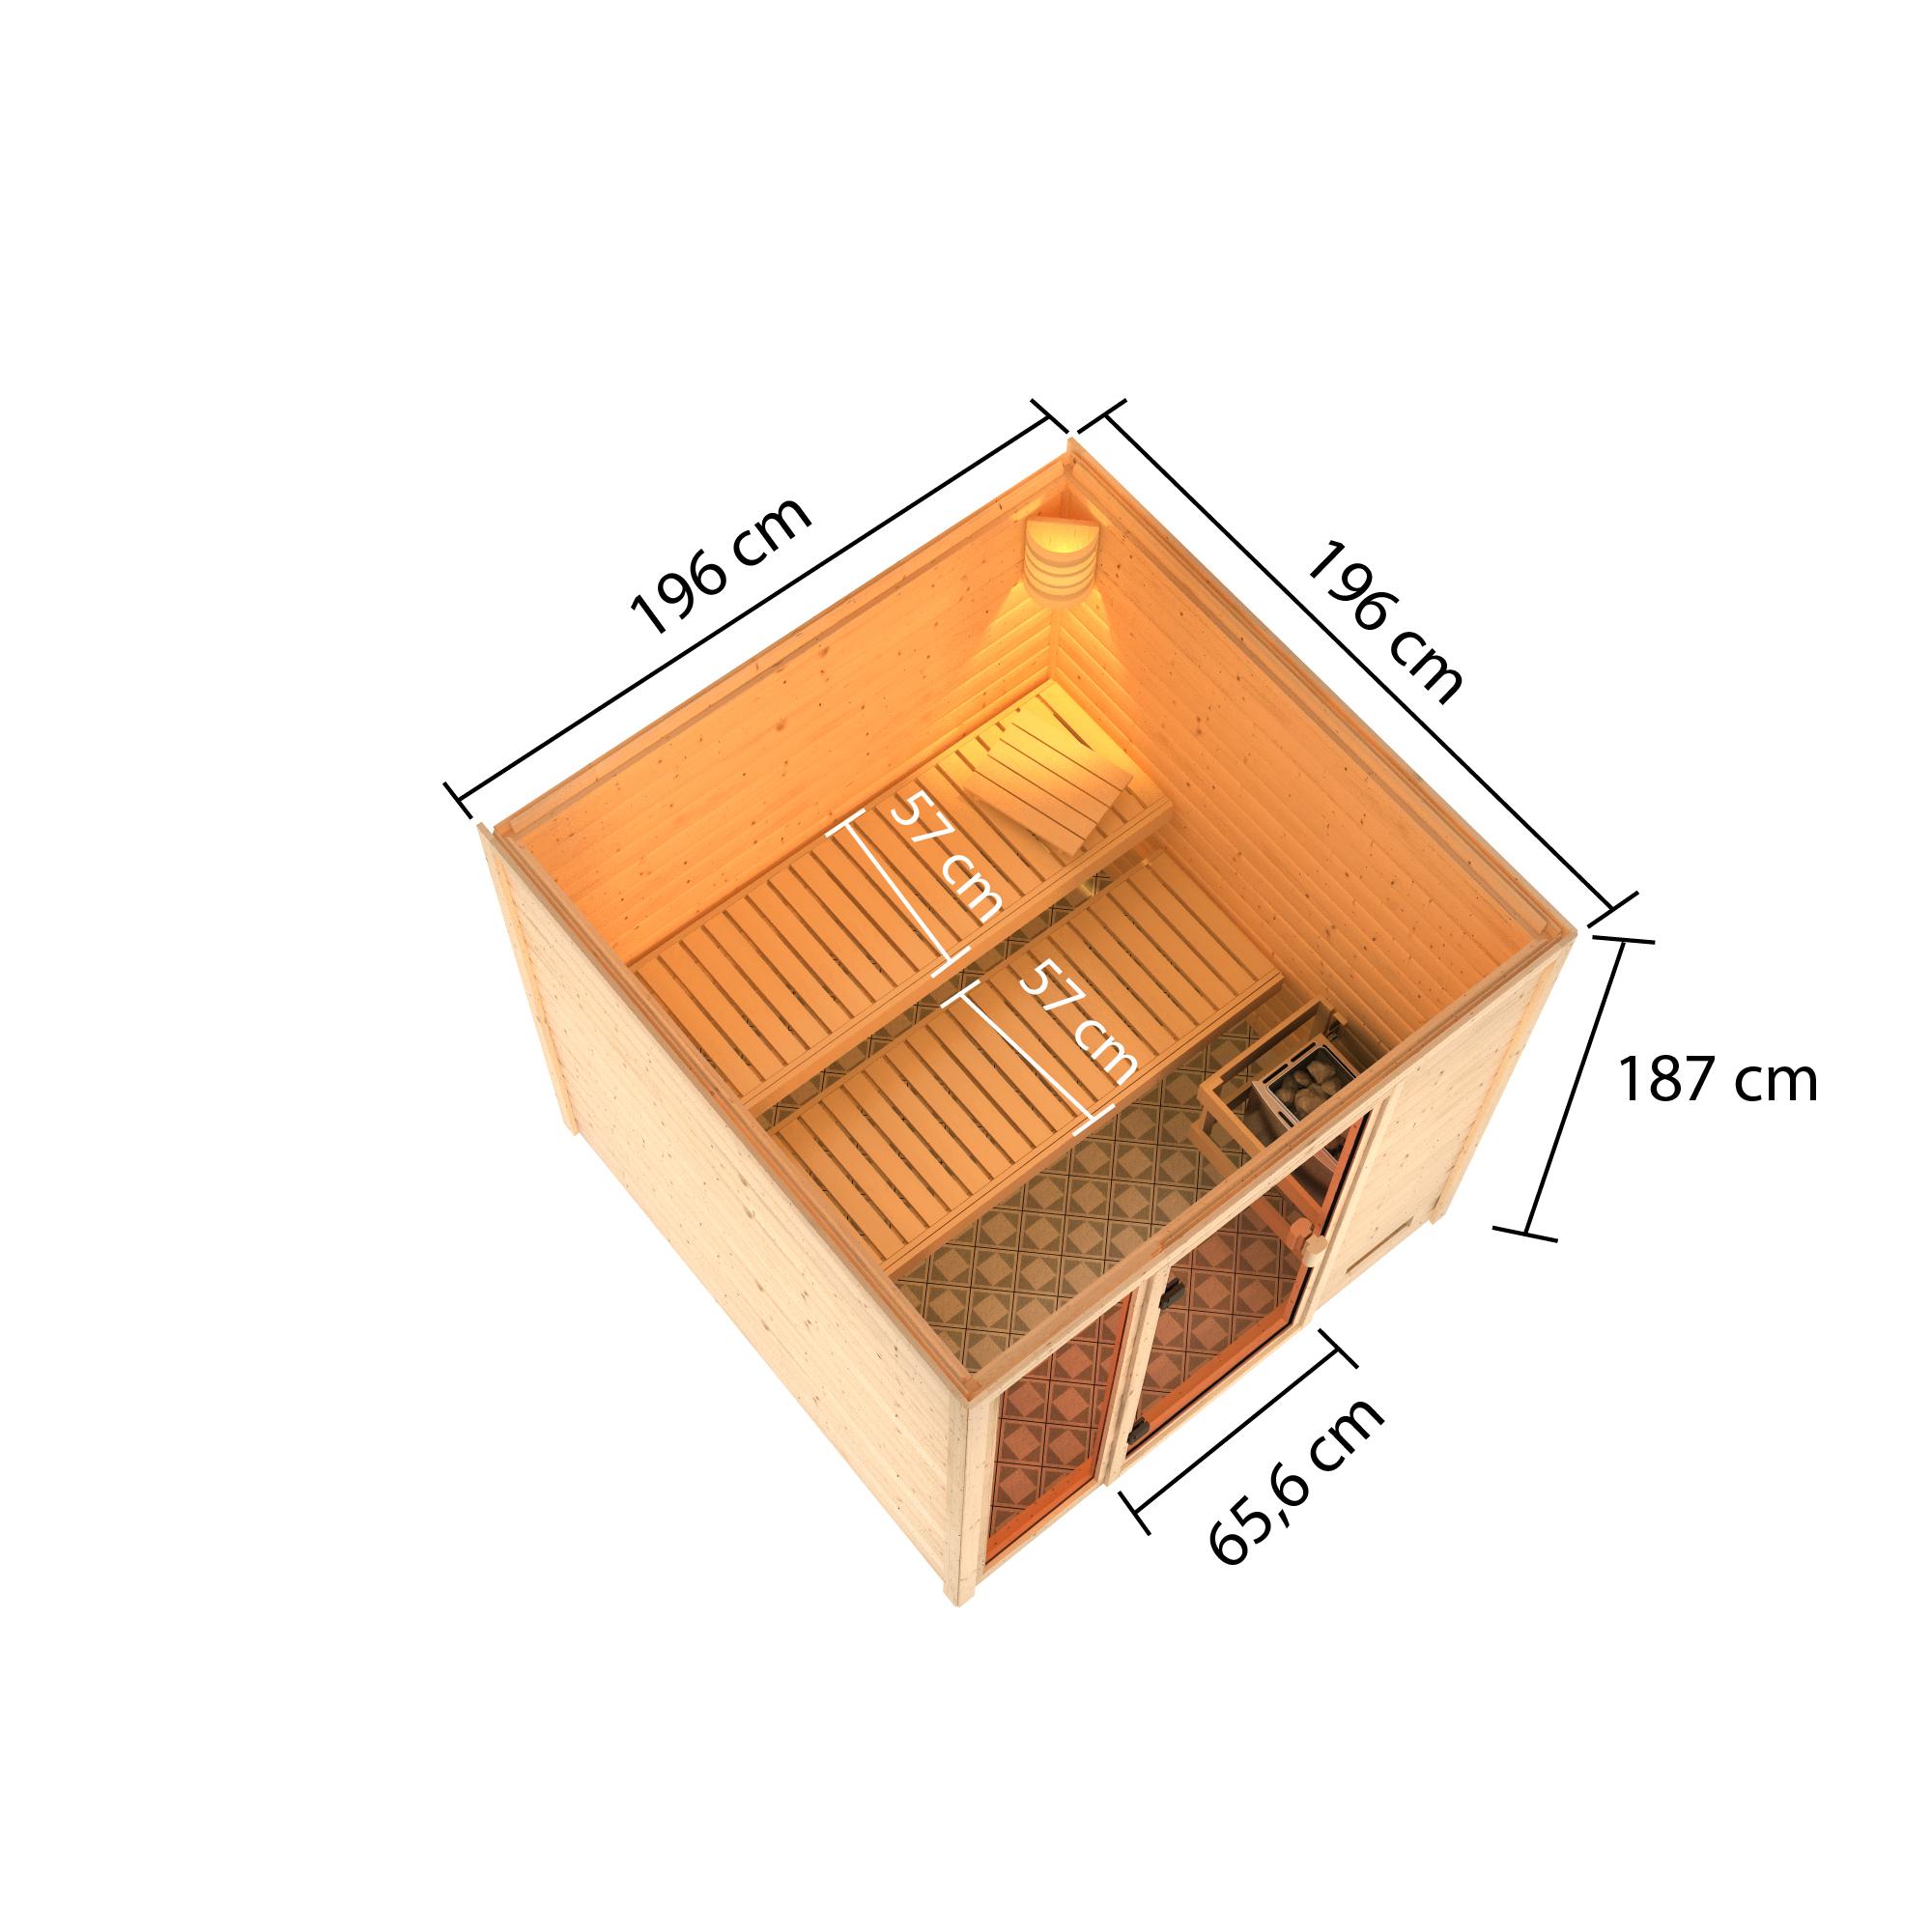 Woodfeeling Sauna Jutta 38mm ohne Saunaofen Bild 4